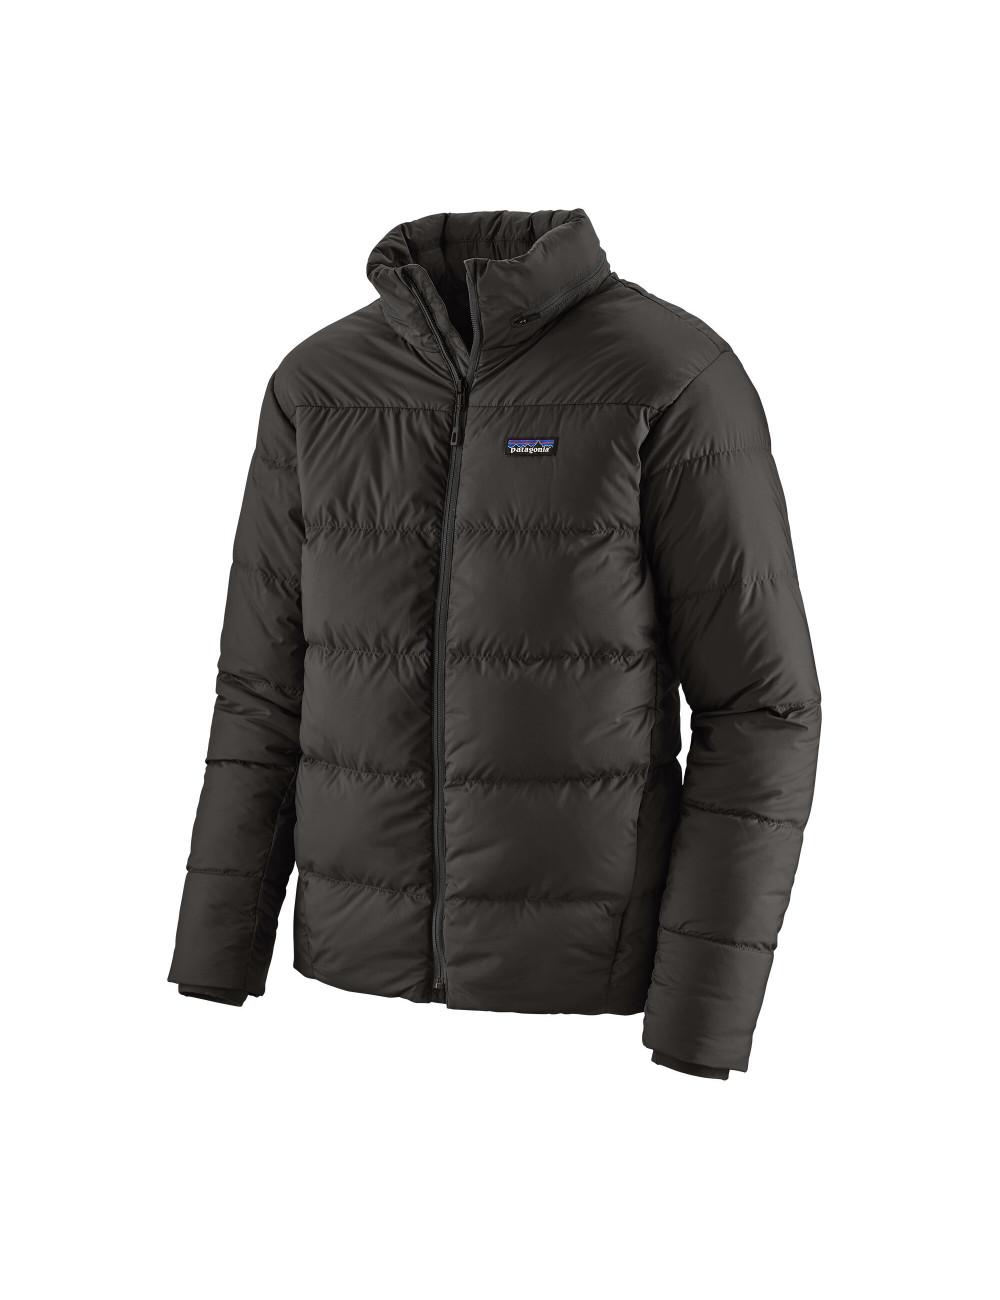 Patagonia Silent down jacket - 27930 | Shapestore.it